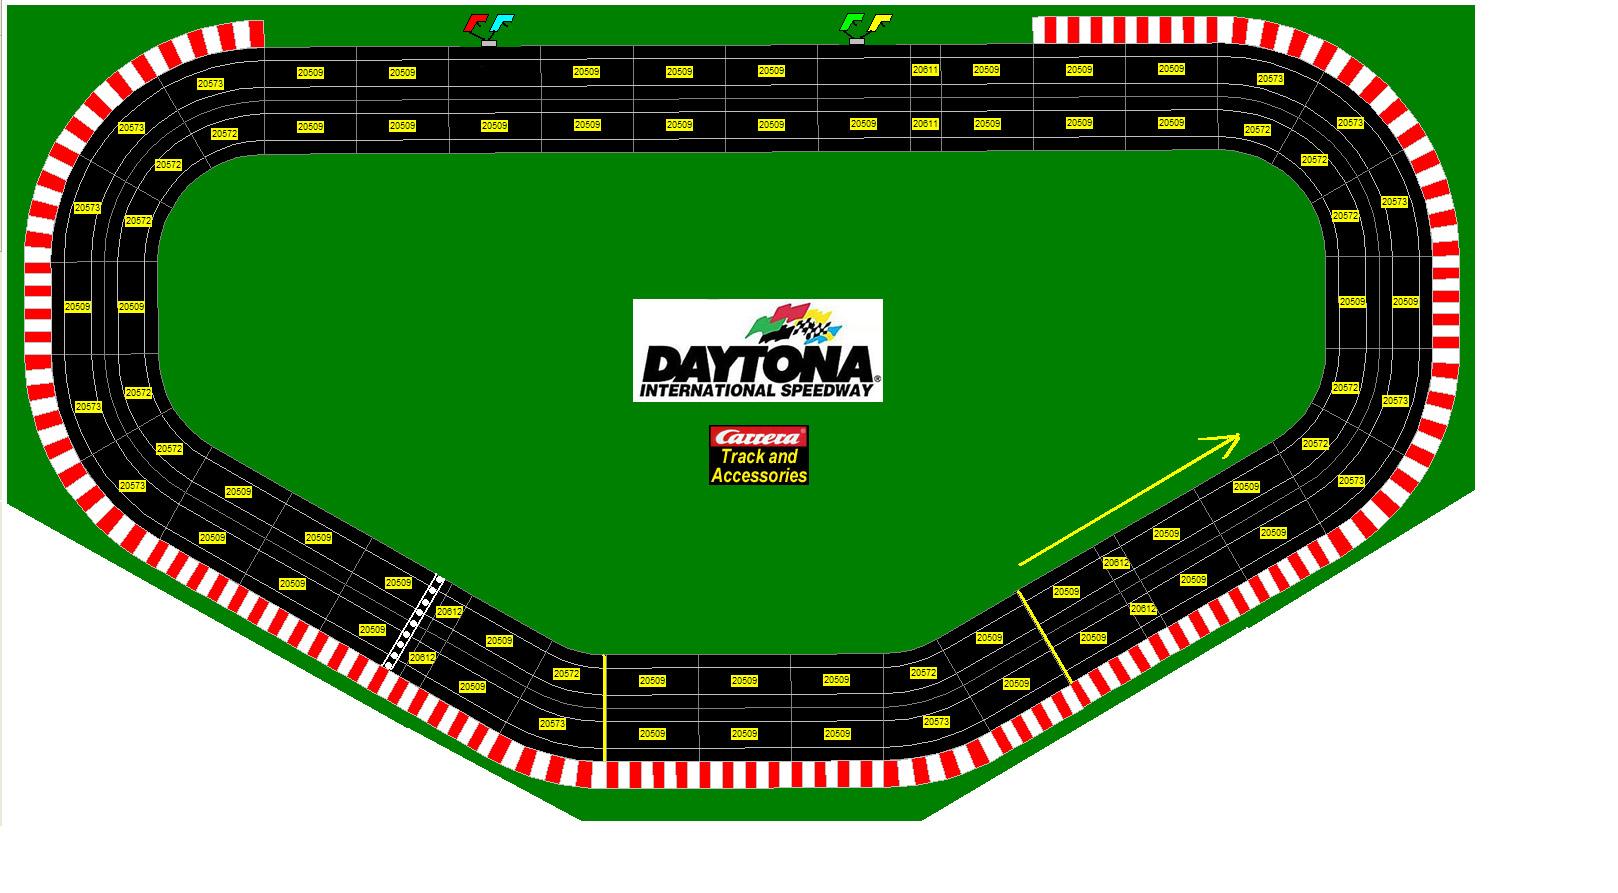 Track 20Design furthermore Rainierraceways likewise Cartoon Car Race Track as well Showthread additionally Watch. on 4 lane carrera track layouts